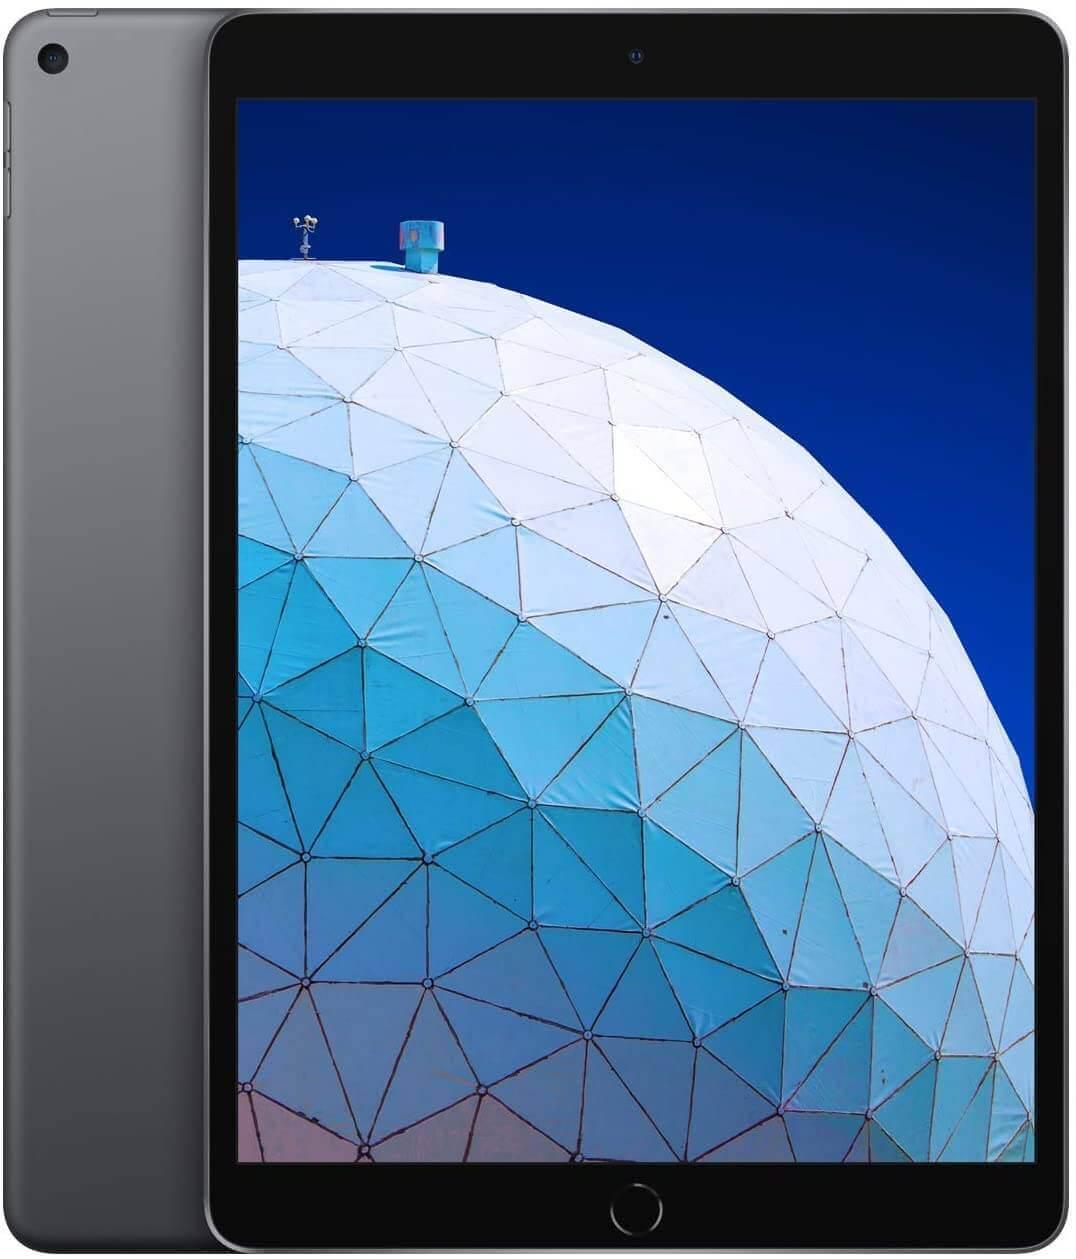 Best Tablet For Vlogging: Apple iPad Air